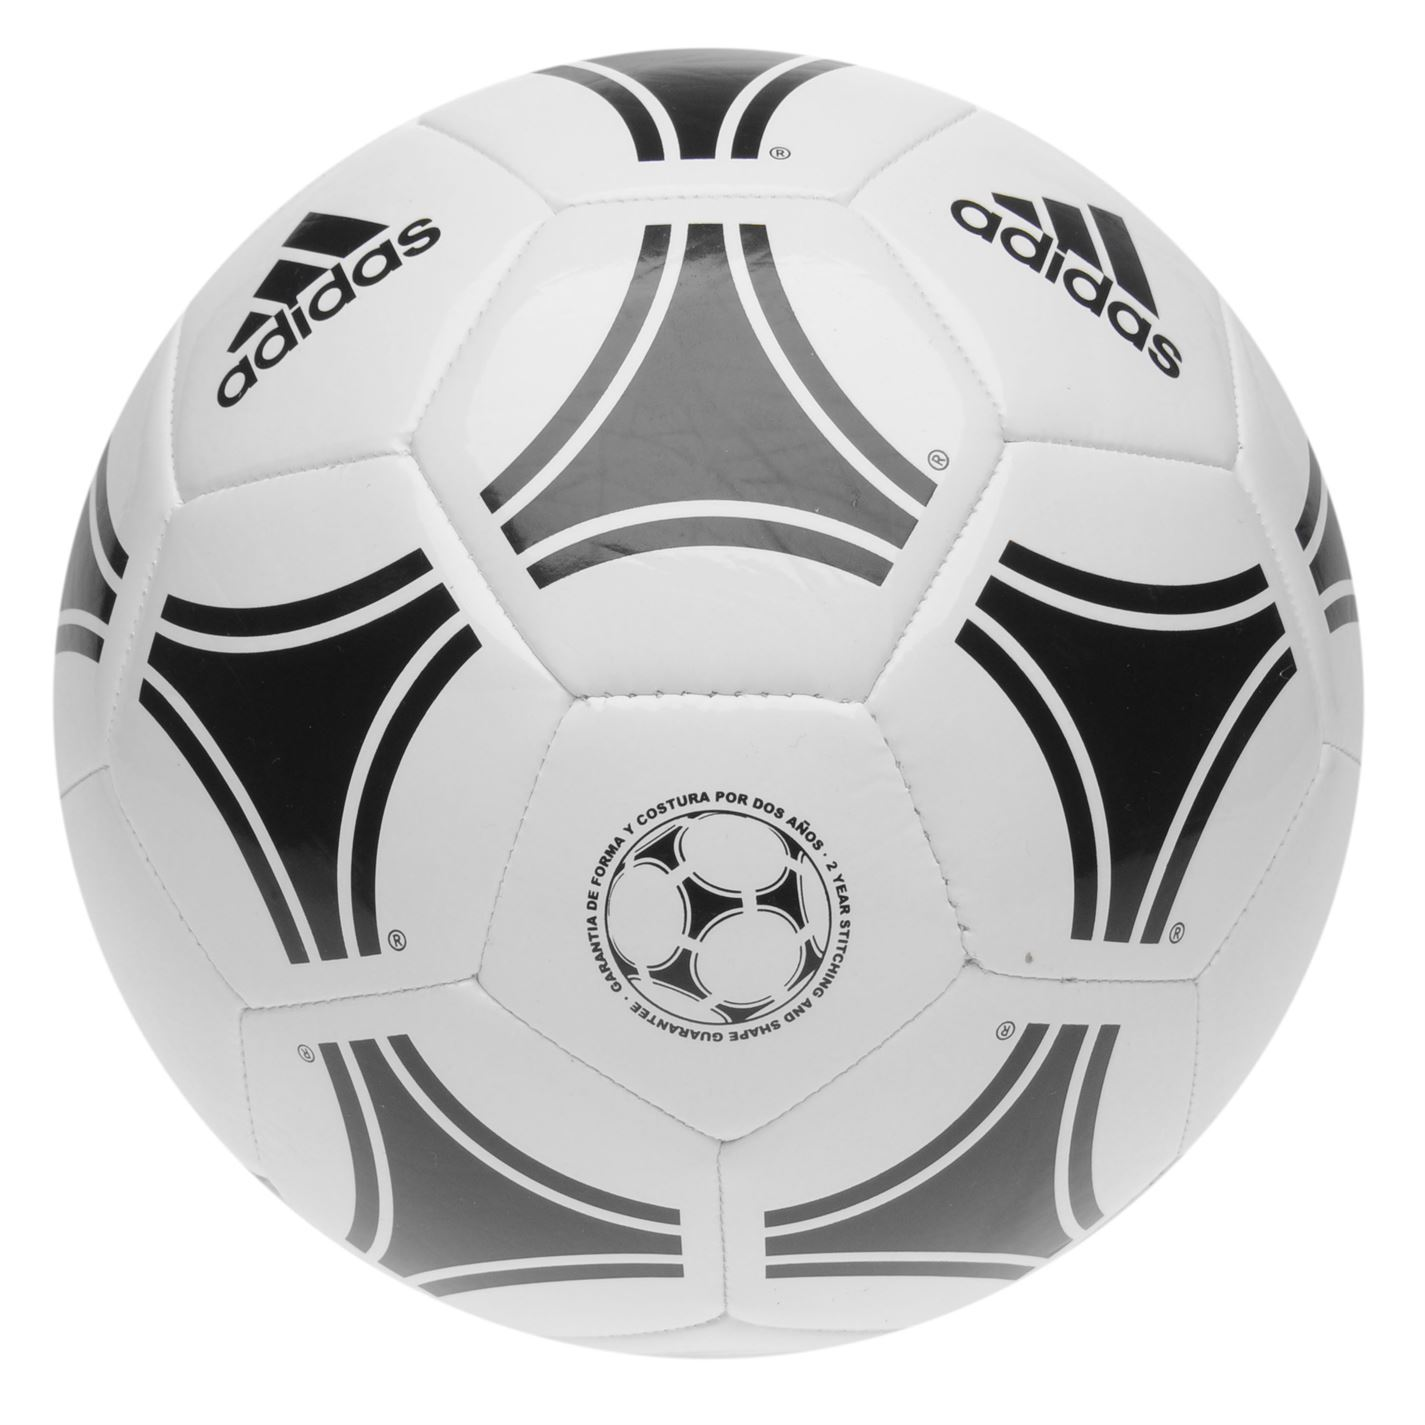 a88b1007d08 Details about adidas Tango Glider Football White Black Soccer Ball